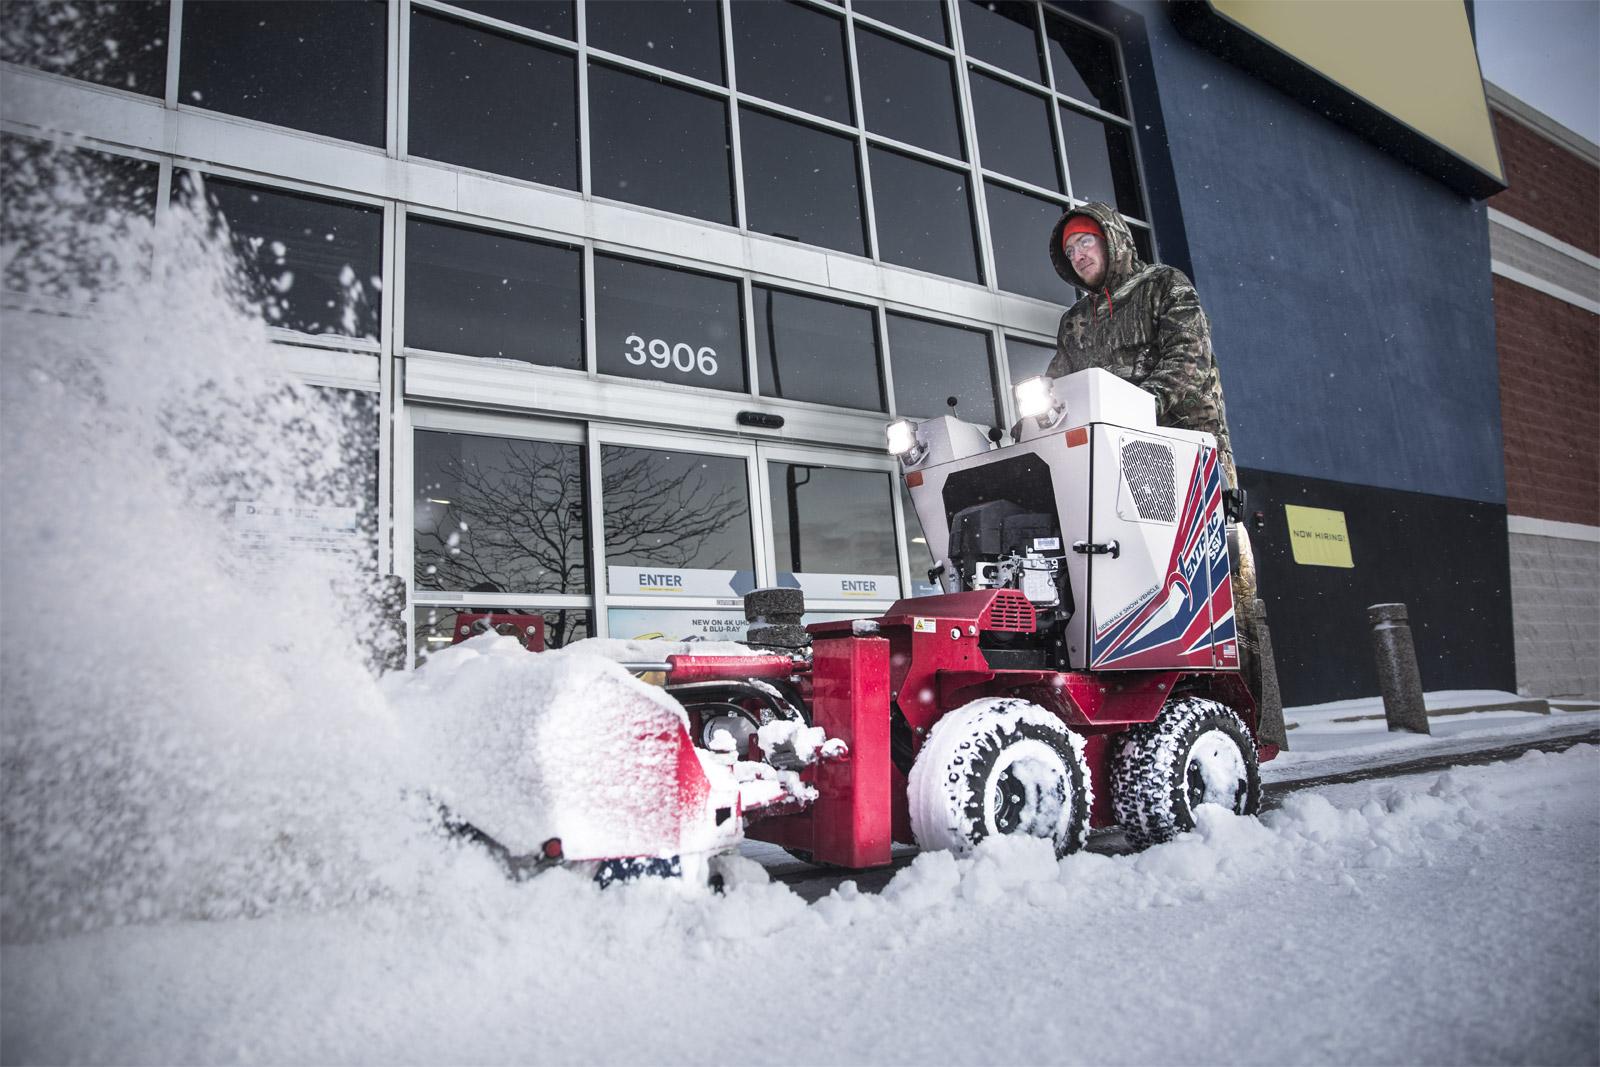 ssv Tractor